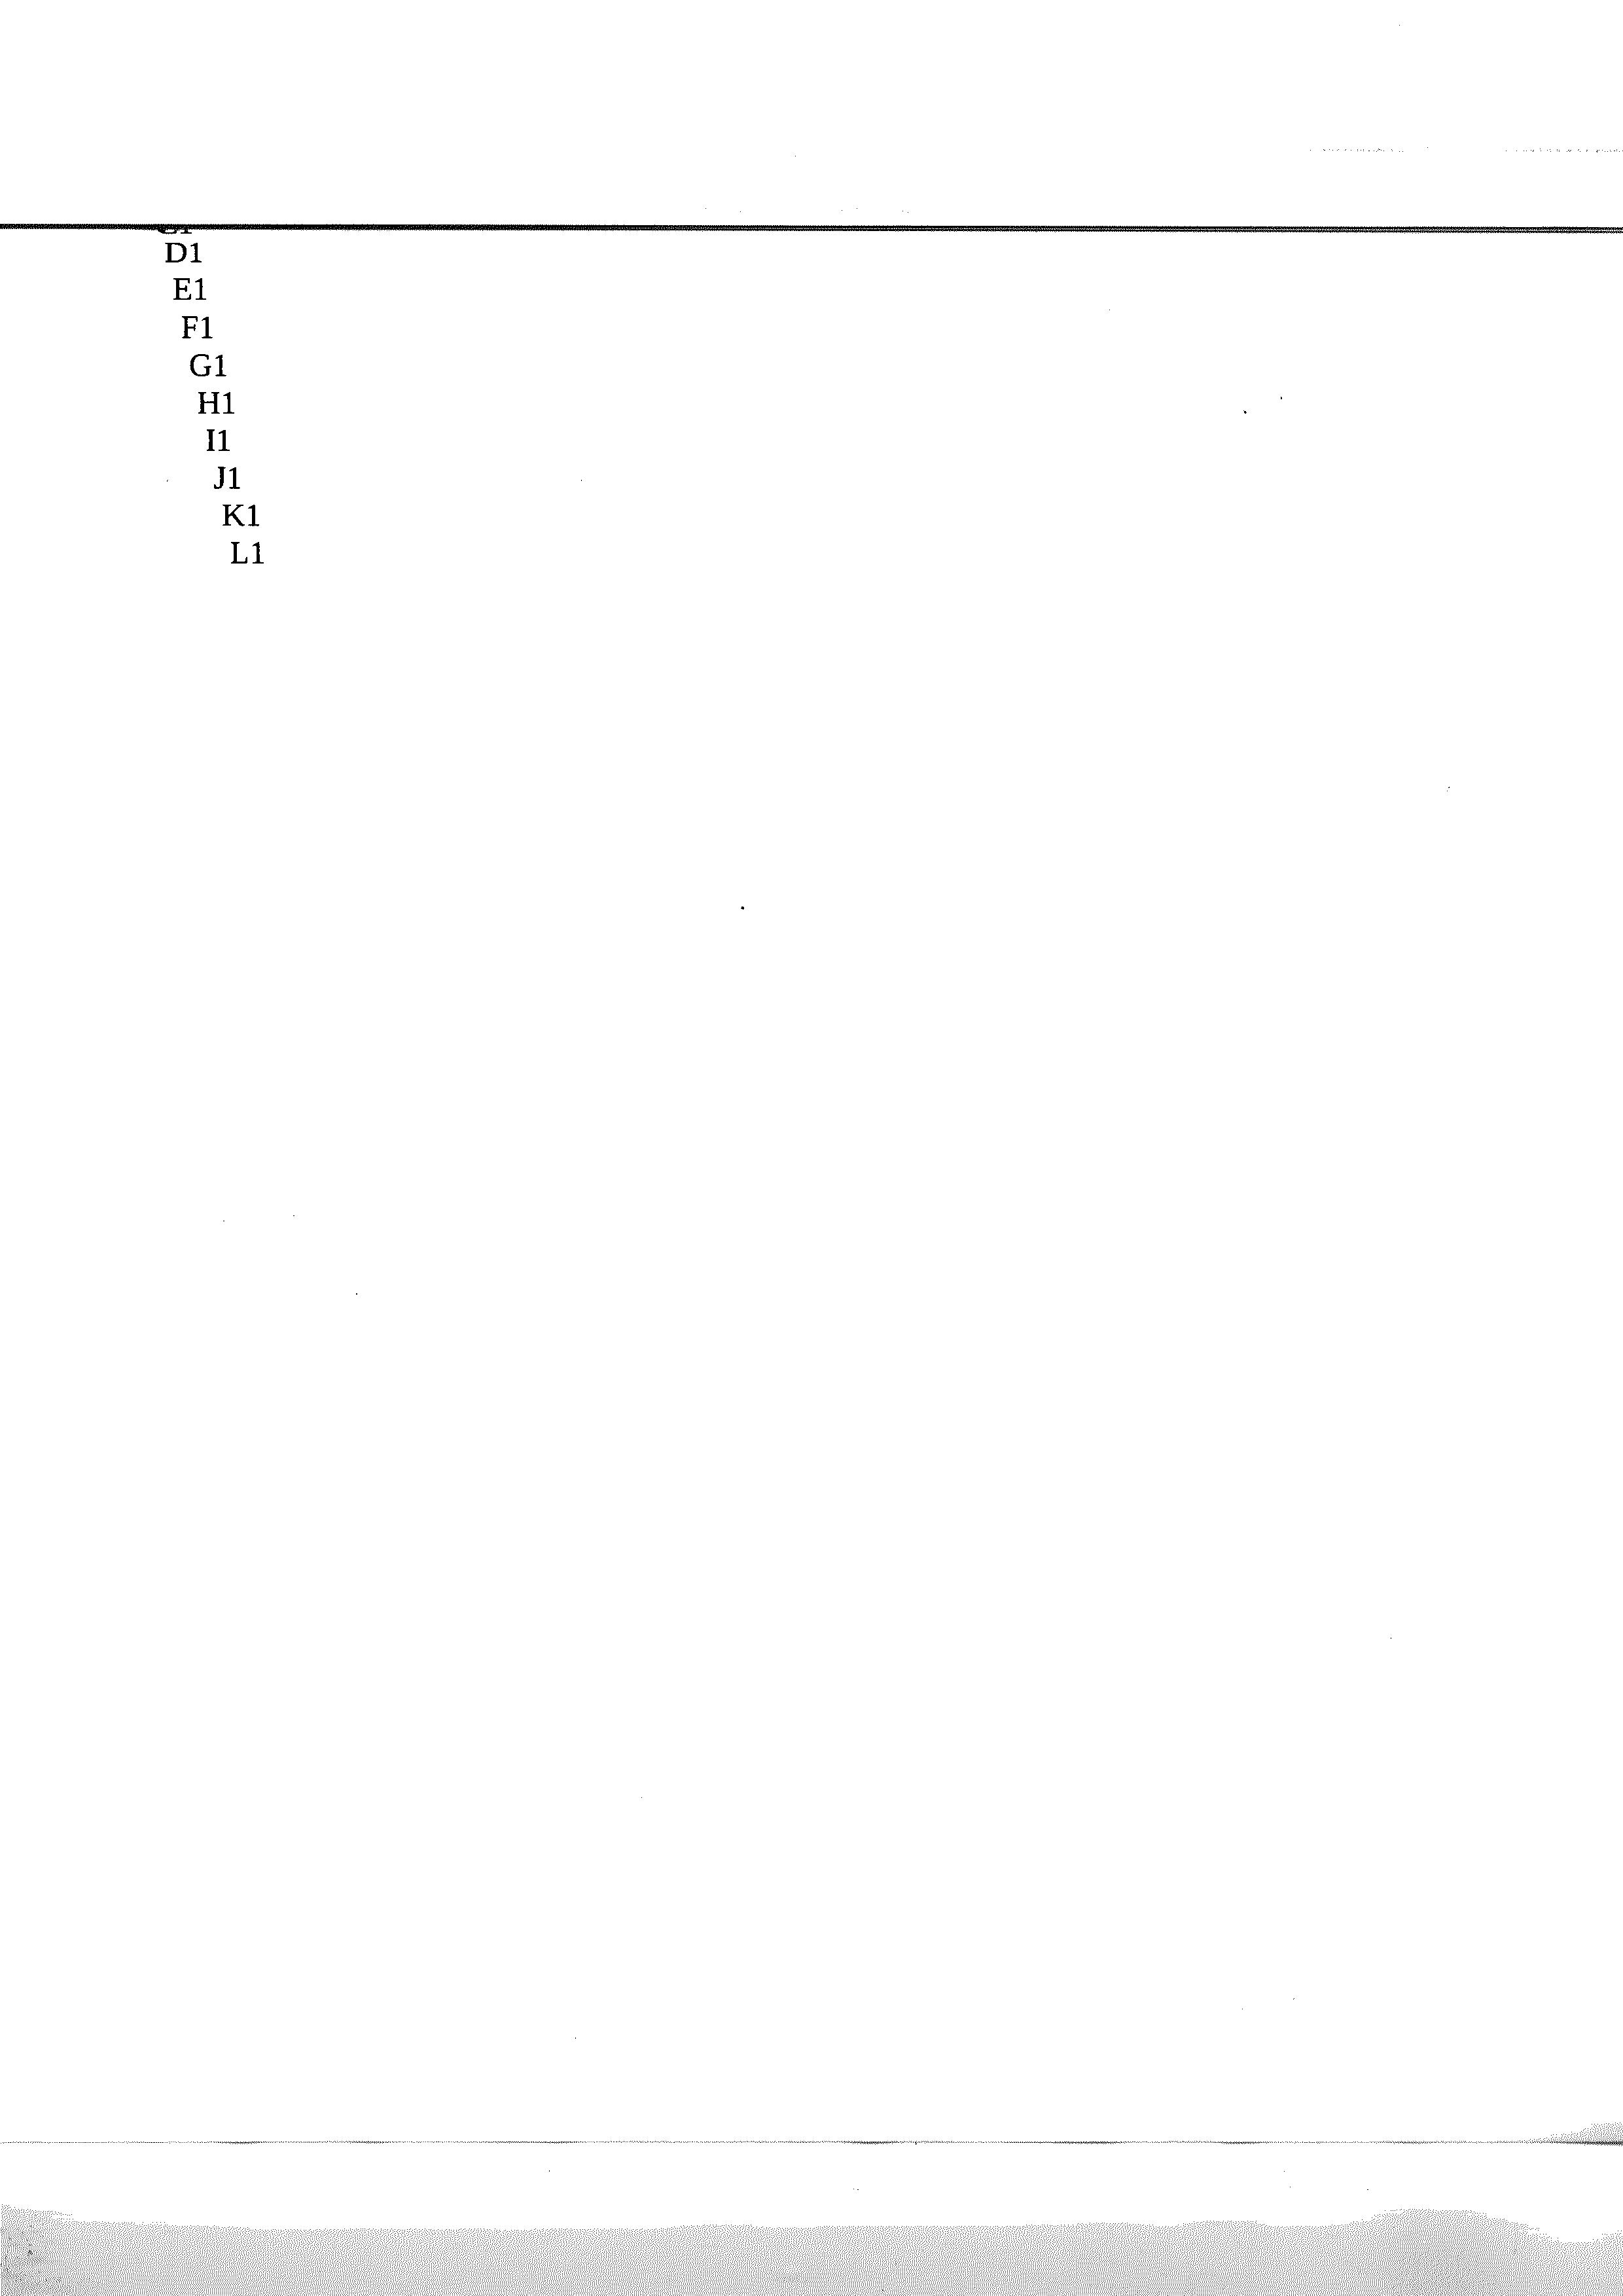 printer-test-1.png